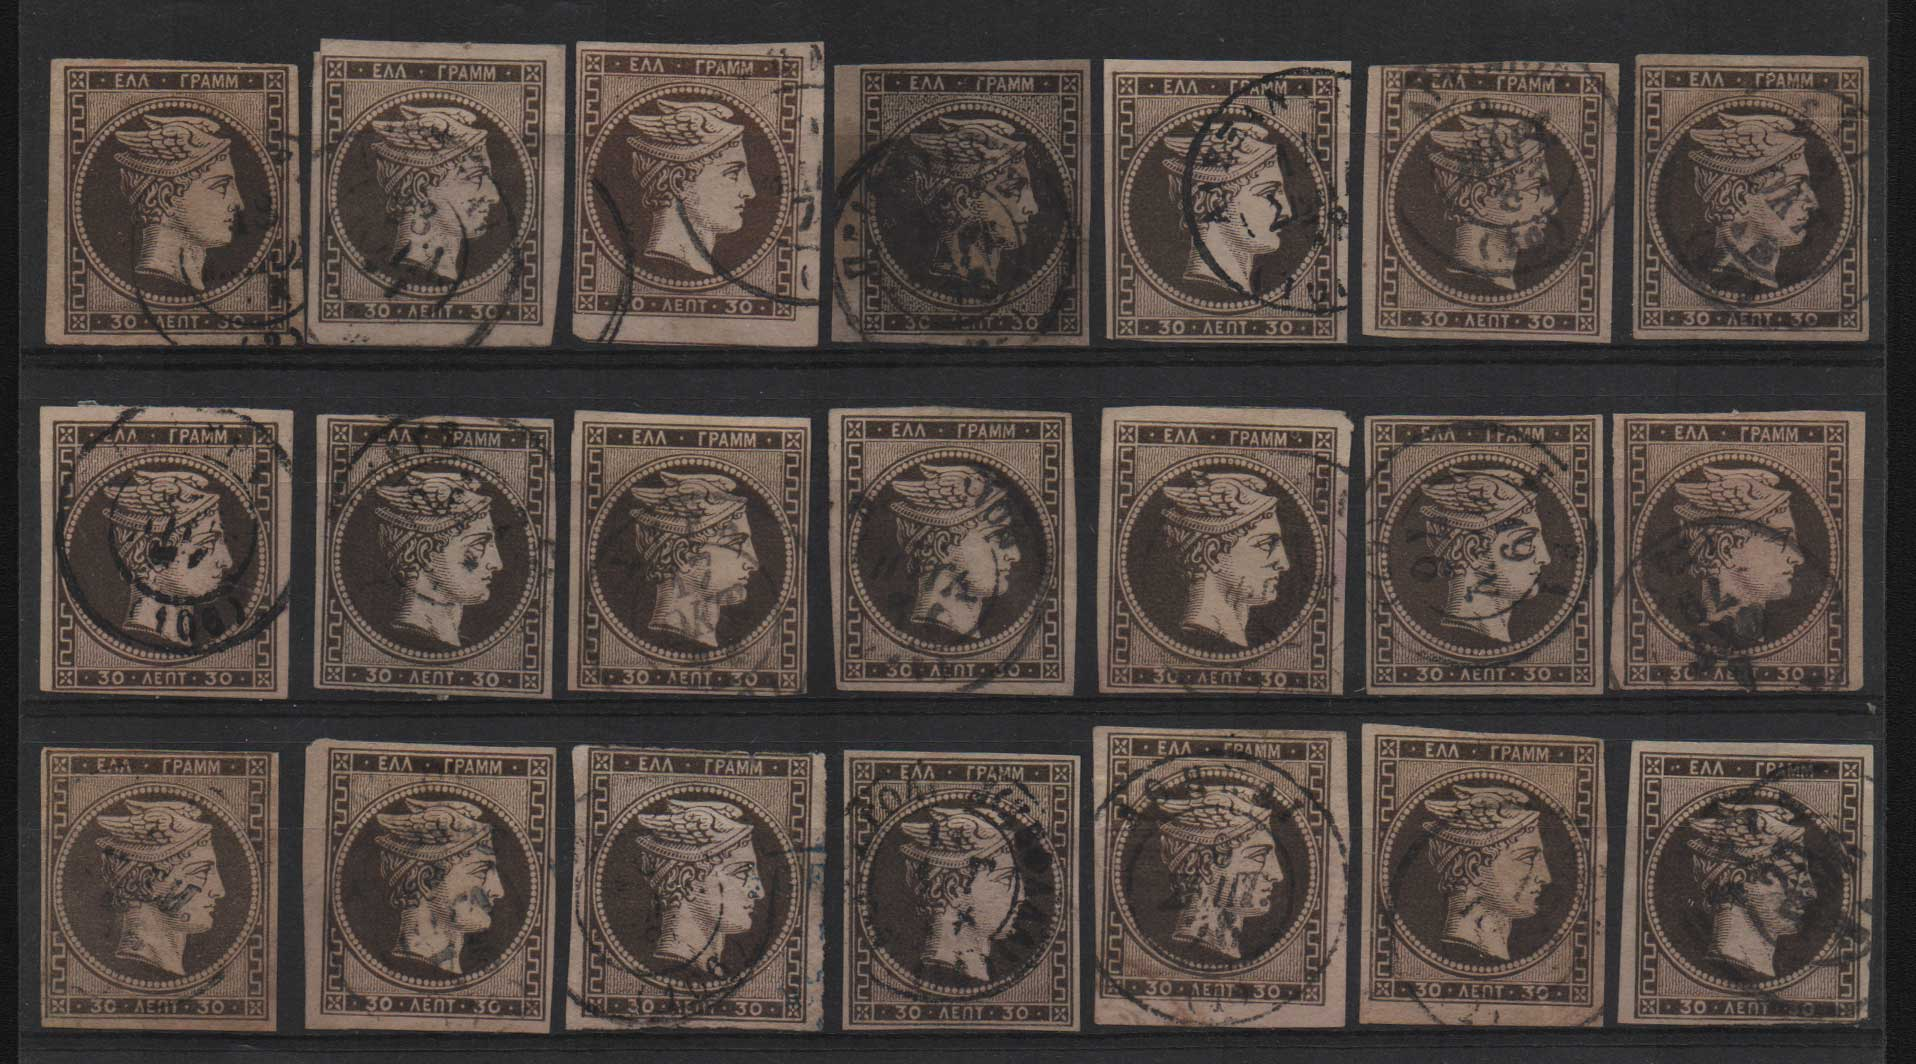 Lot 16 - -  LARGE HERMES HEAD large hermes head -  Athens Auctions Public Auction 69 General Stamp Sale